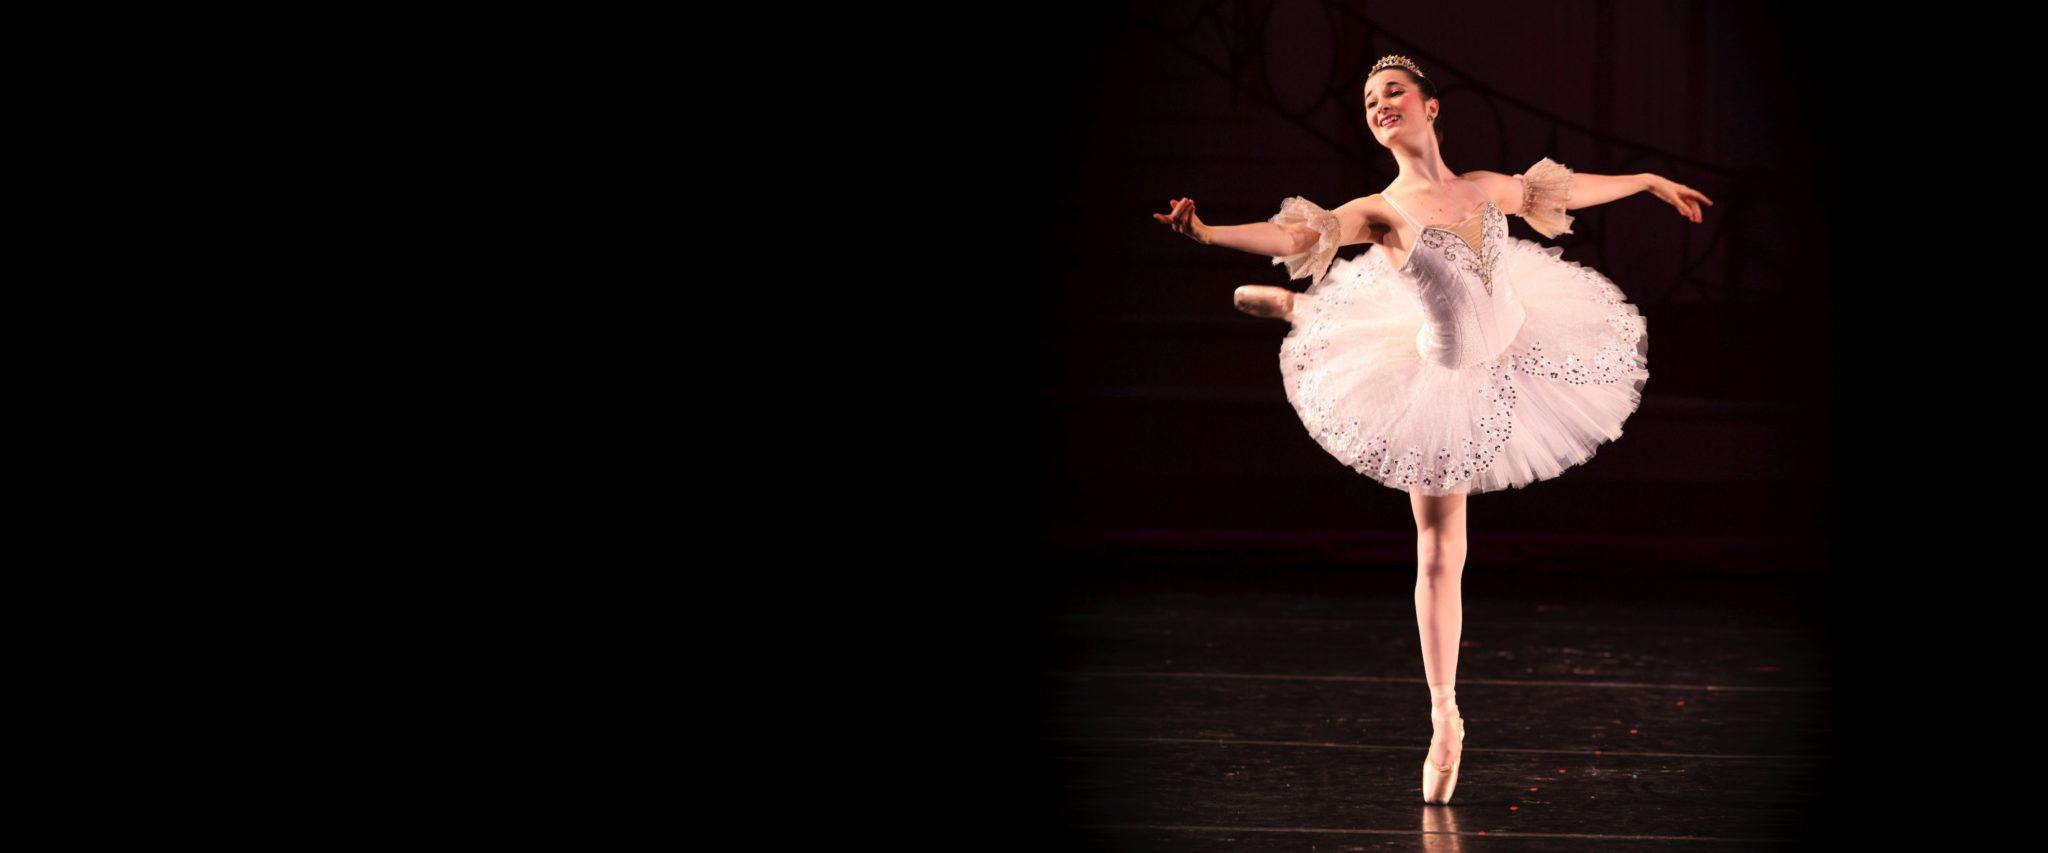 Westside Ballet - Training in classical ballet for all ...